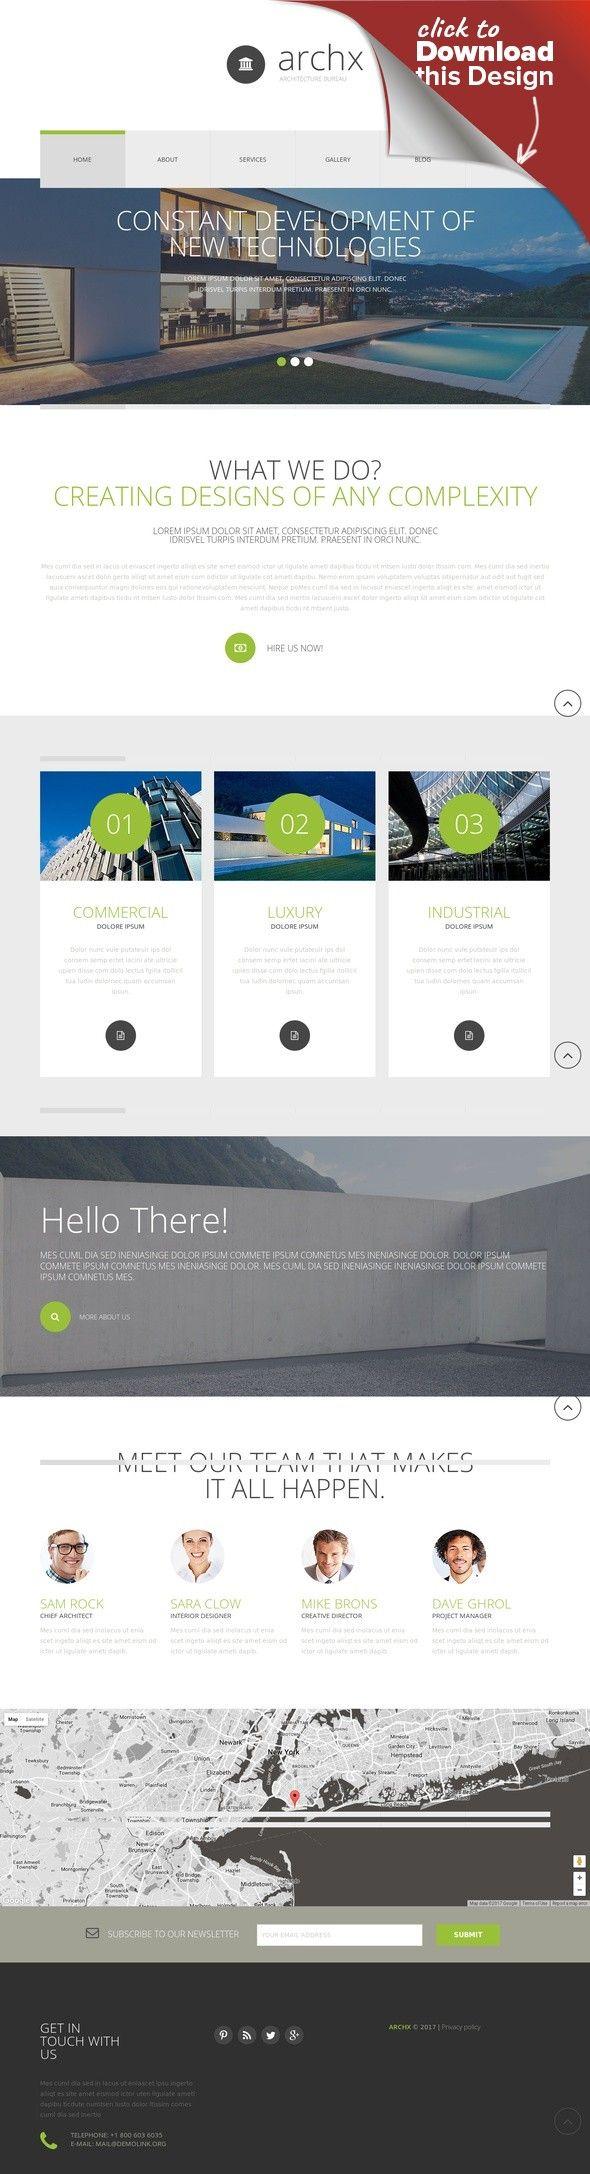 Architecture Responsive Joomla Template CMS & Blog Templates, Joomla Templates, Design & Photography, Design, Architecture